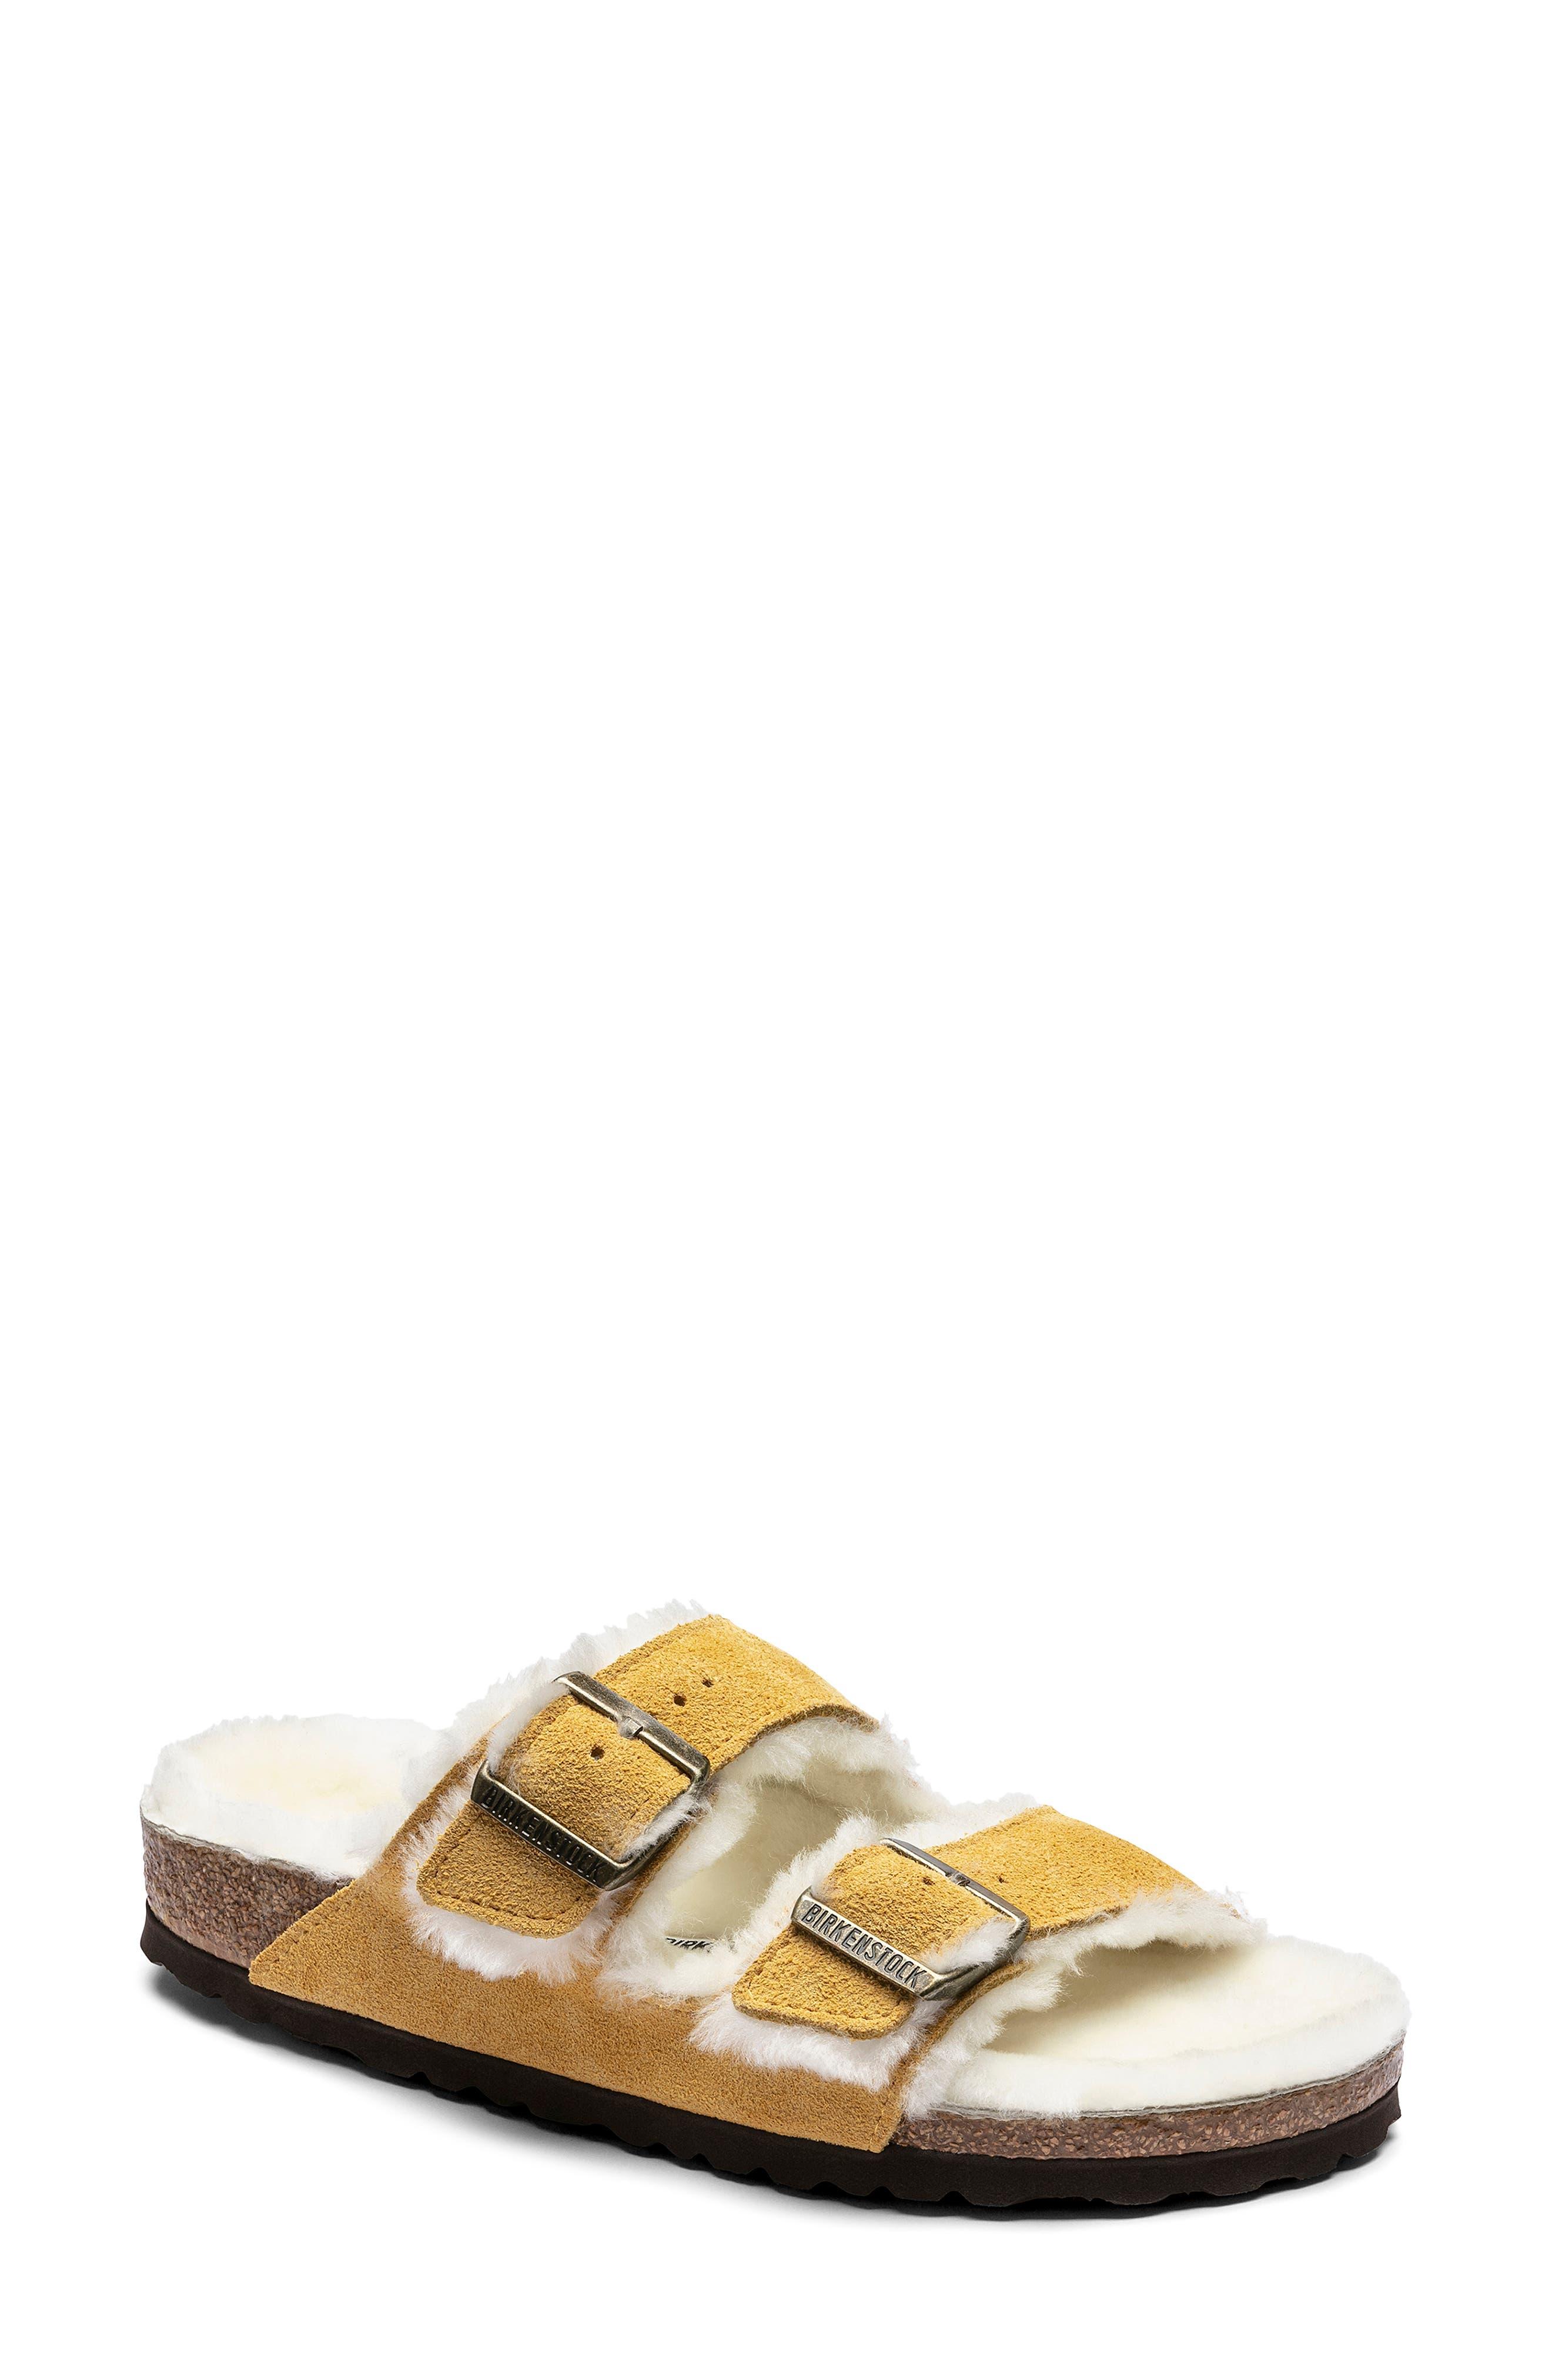 custom gucci birkenstocks